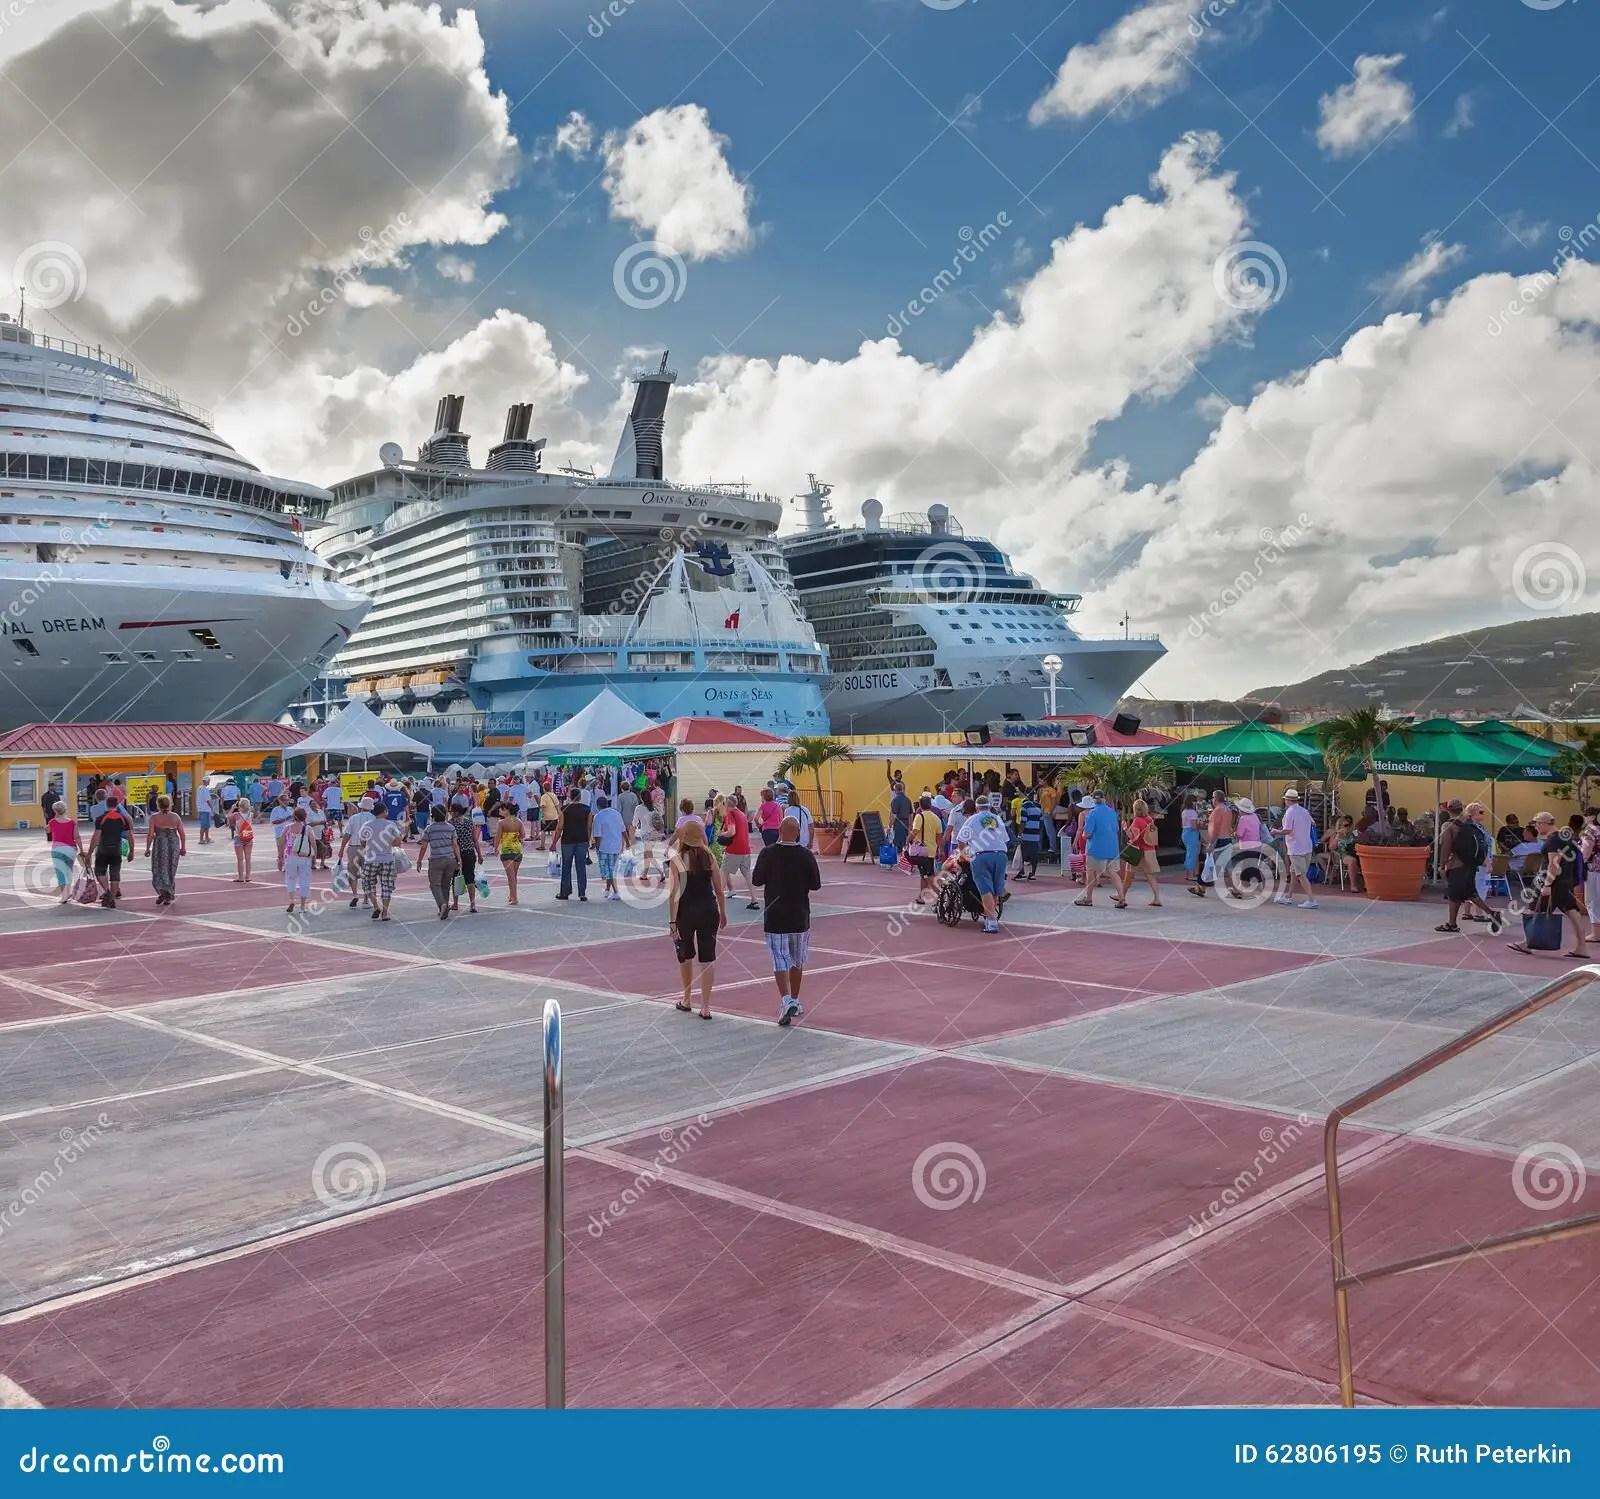 philipsburg cruise port editorial